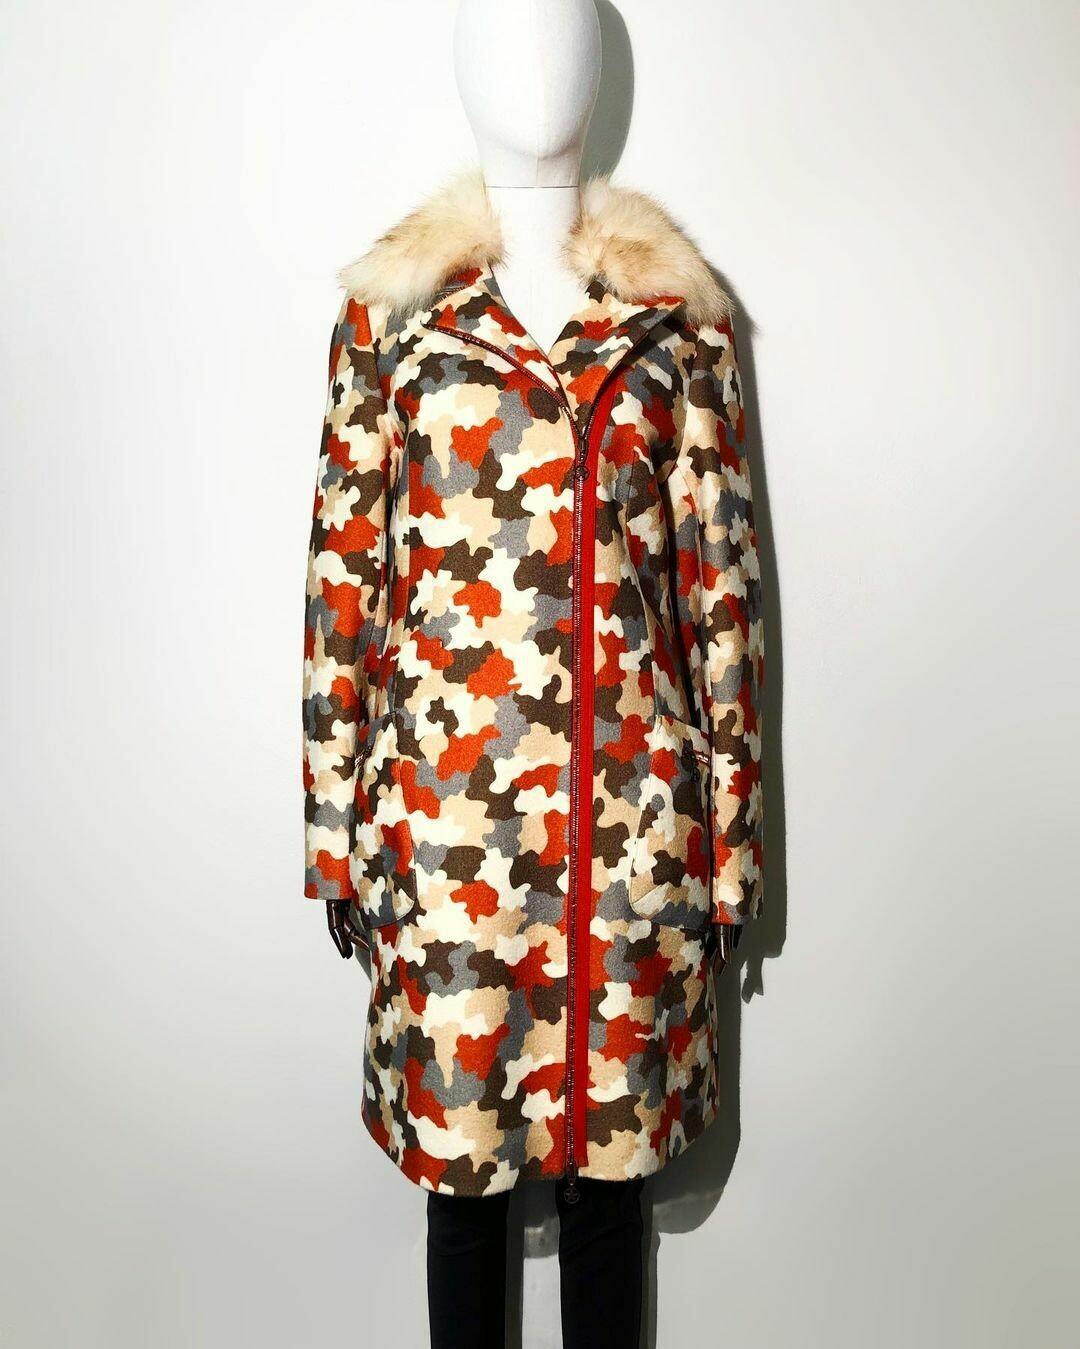 Пальто от Ekaterina Smolina